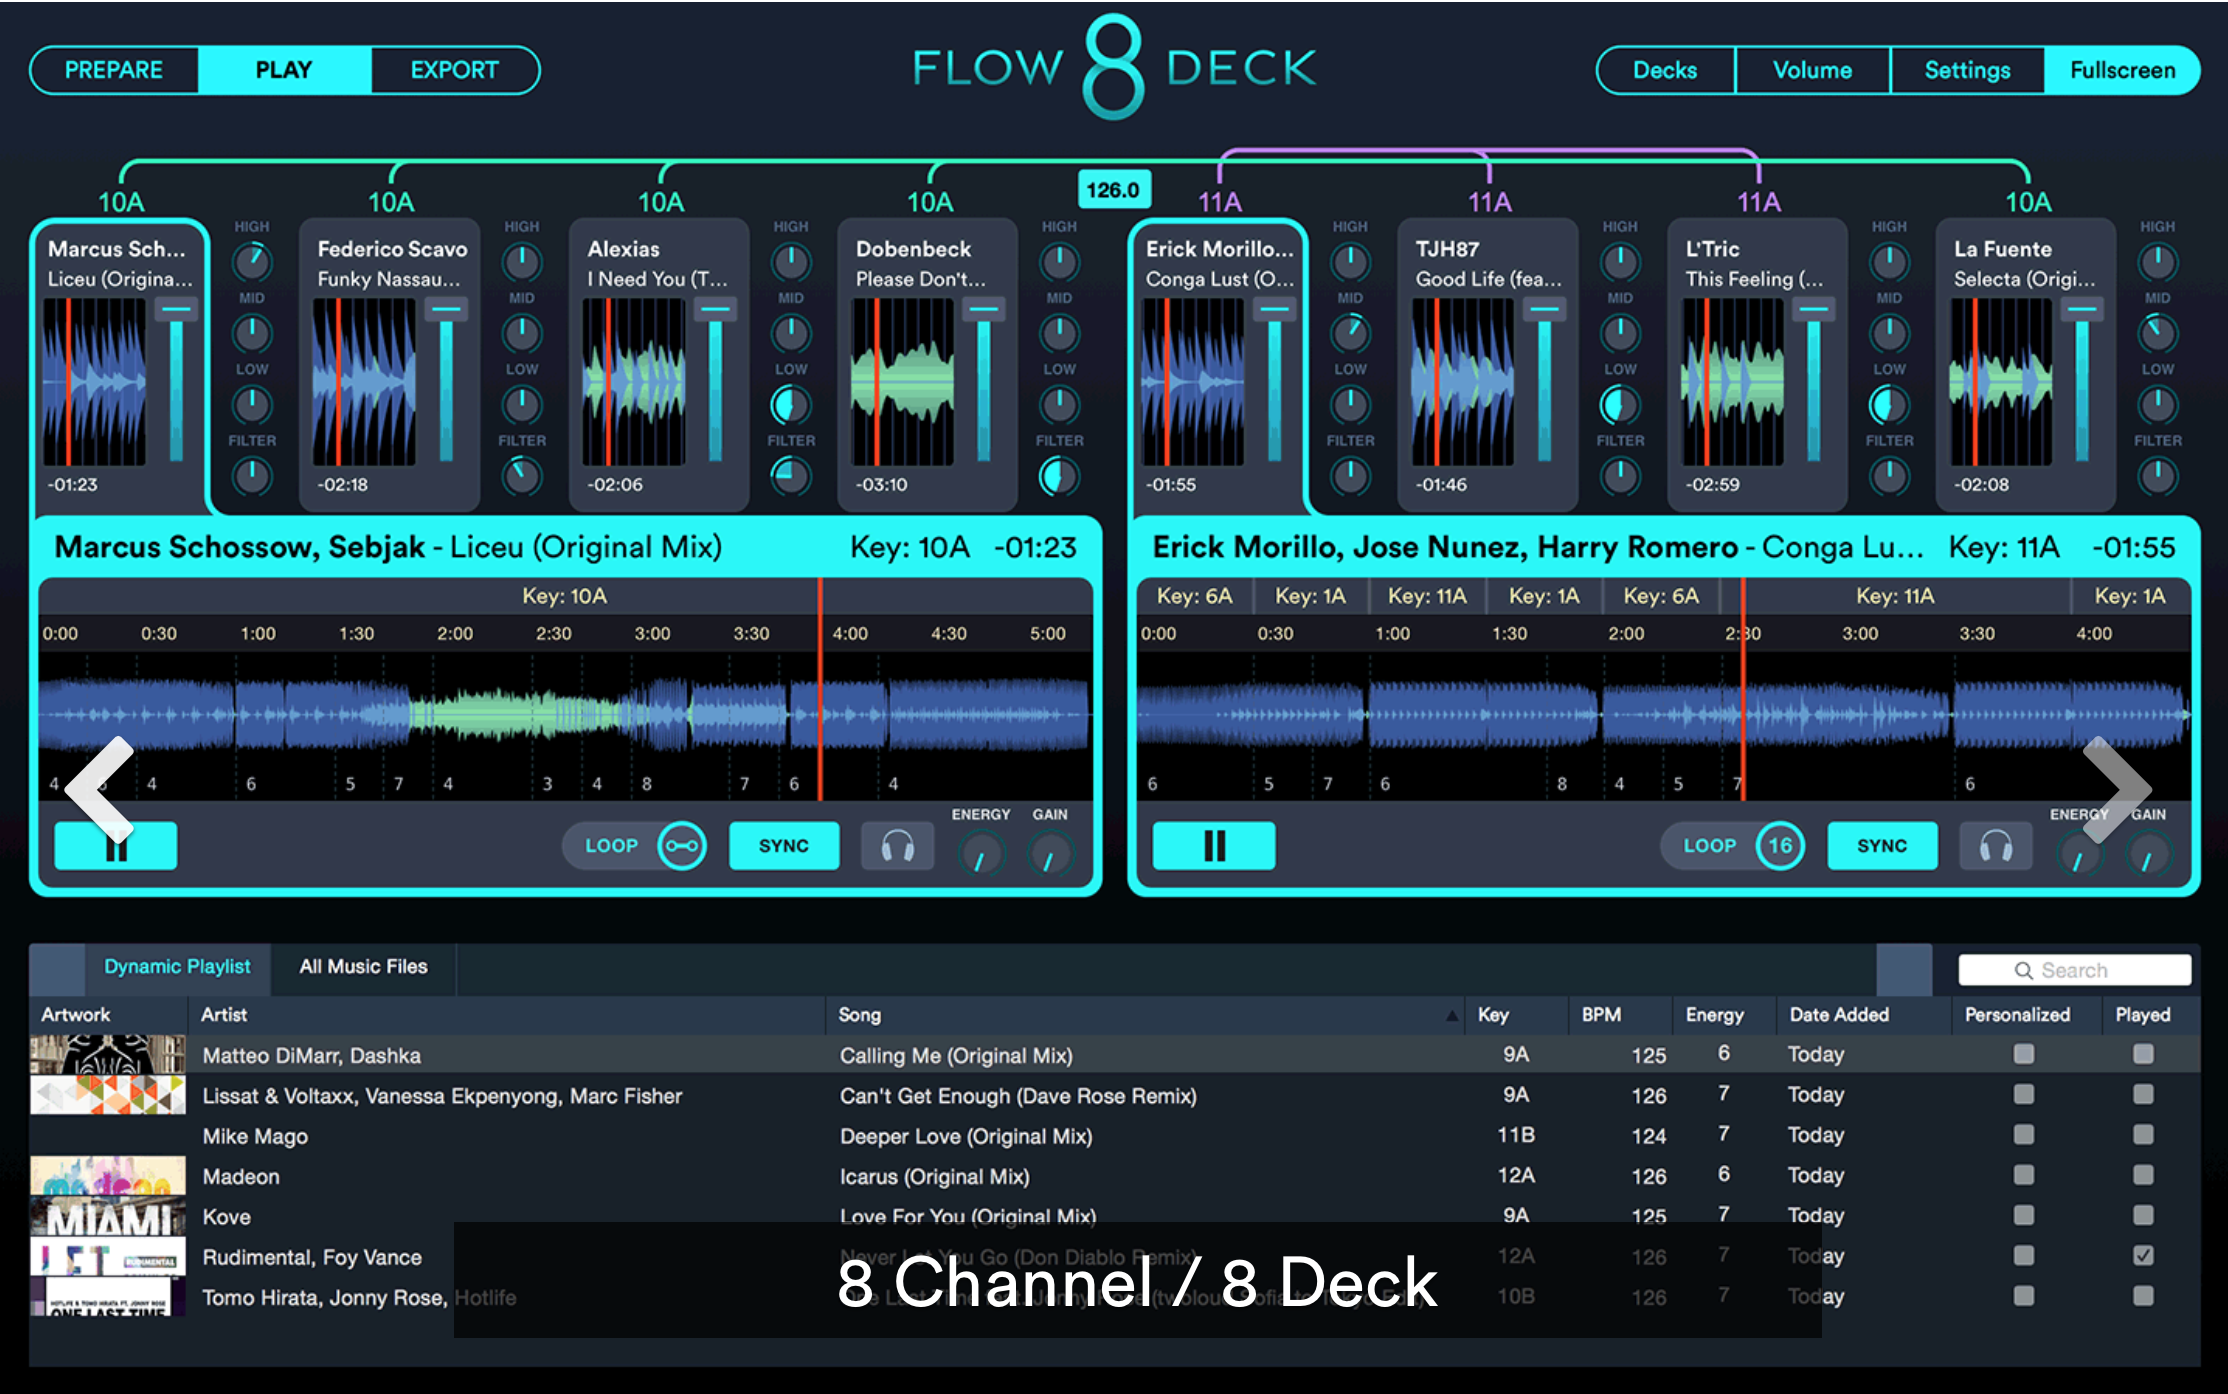 Mixed in Key Flow 8 Deck - 8-Deck DJ Software mit STEMS Feature